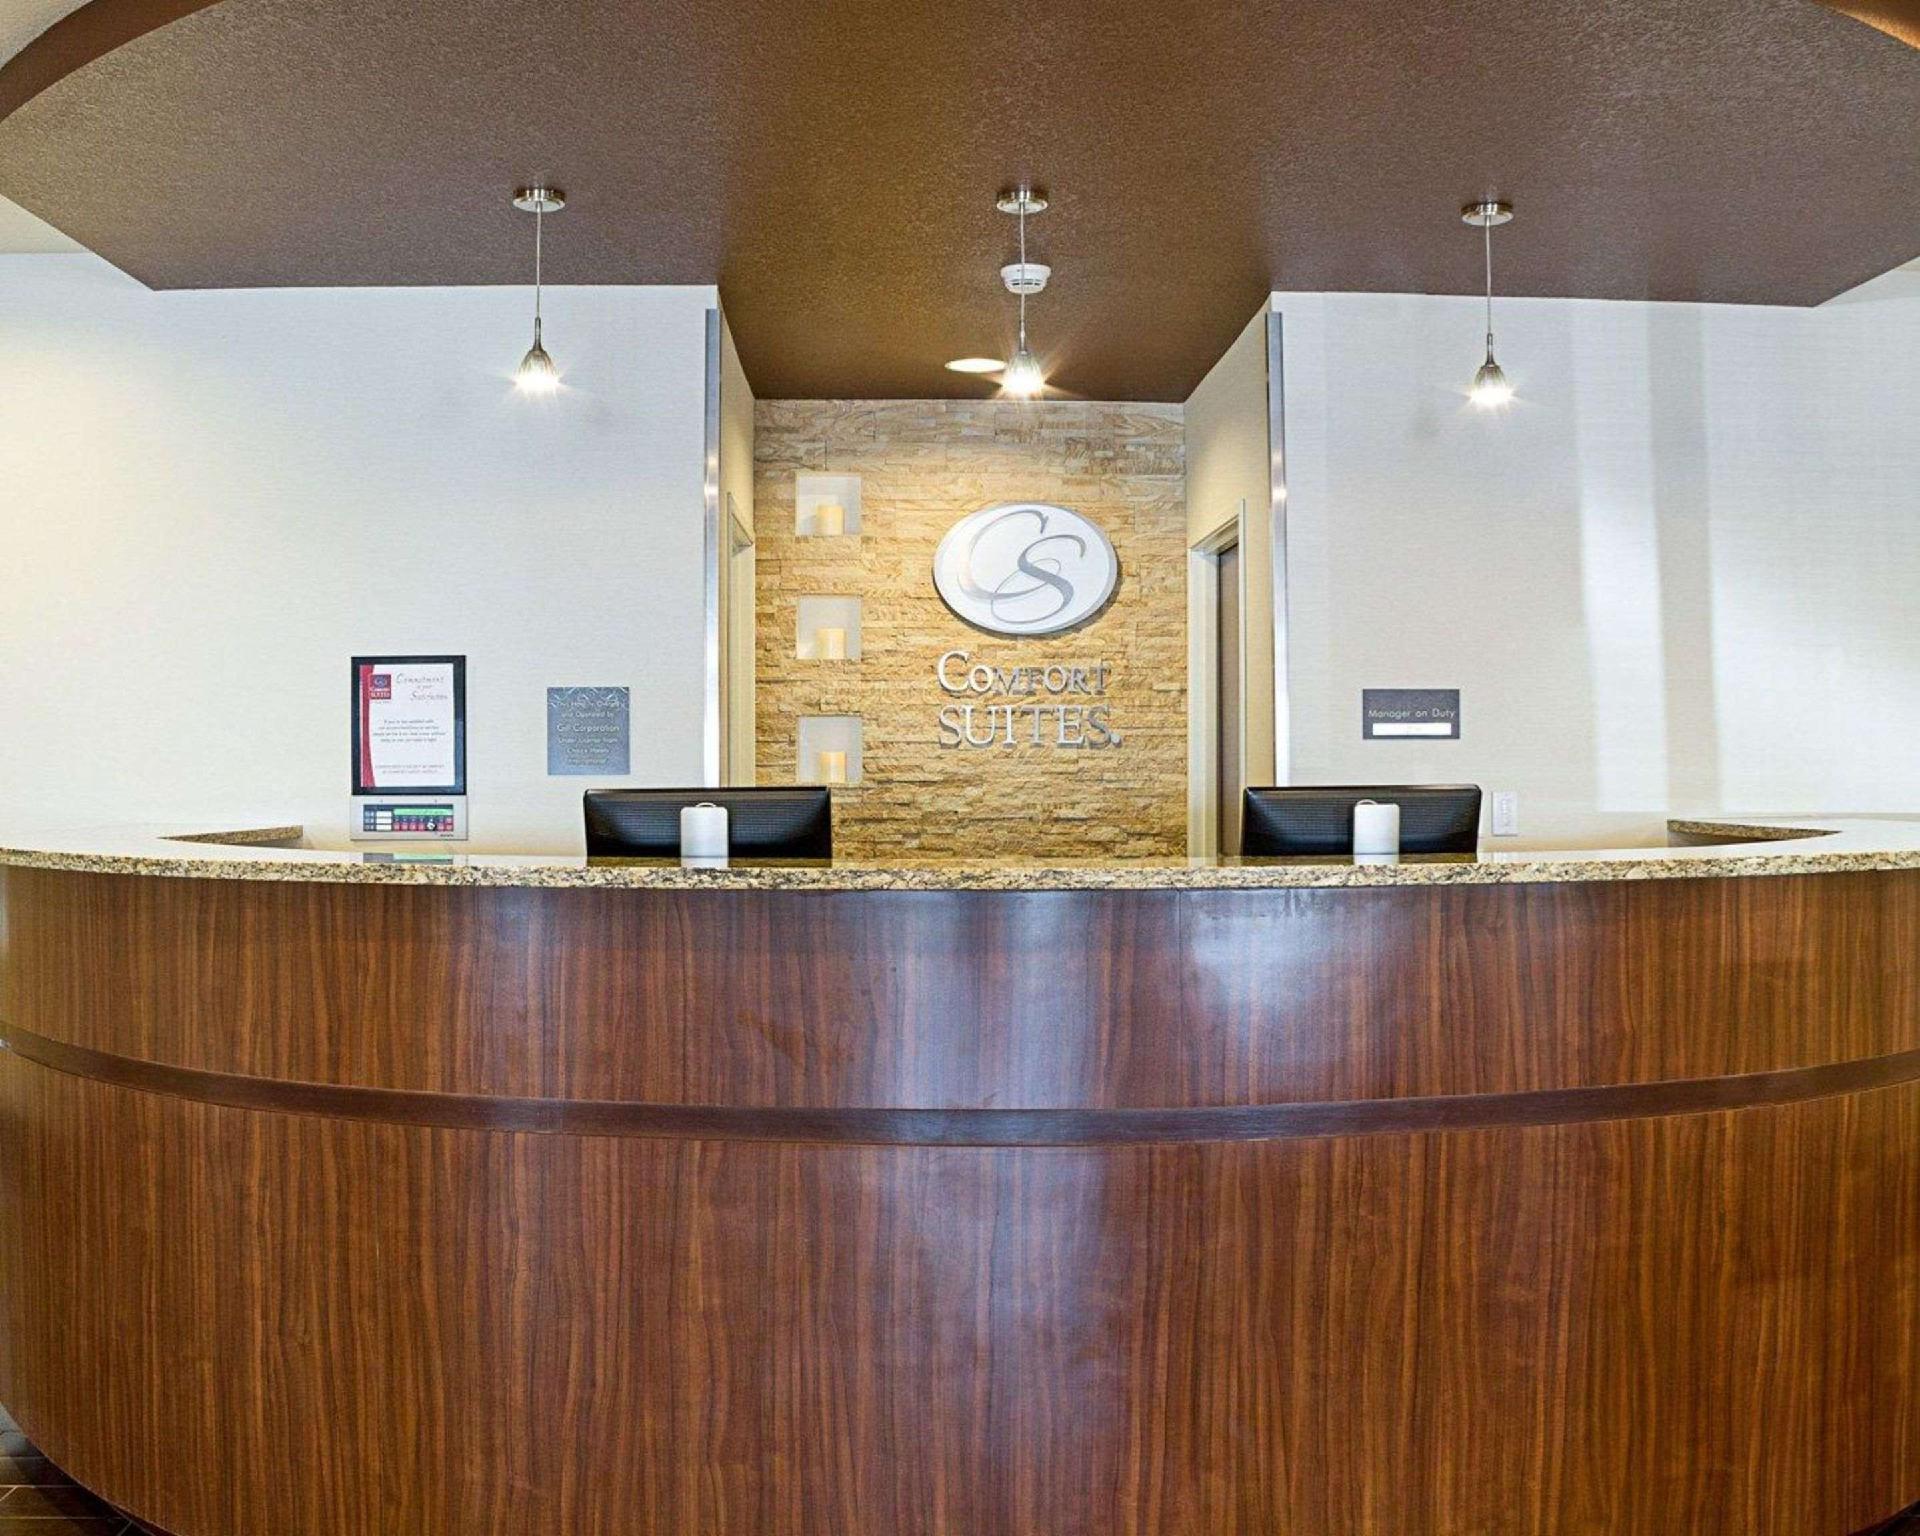 Best Price On Comfort Suites Hotel Minot In Minot Nd